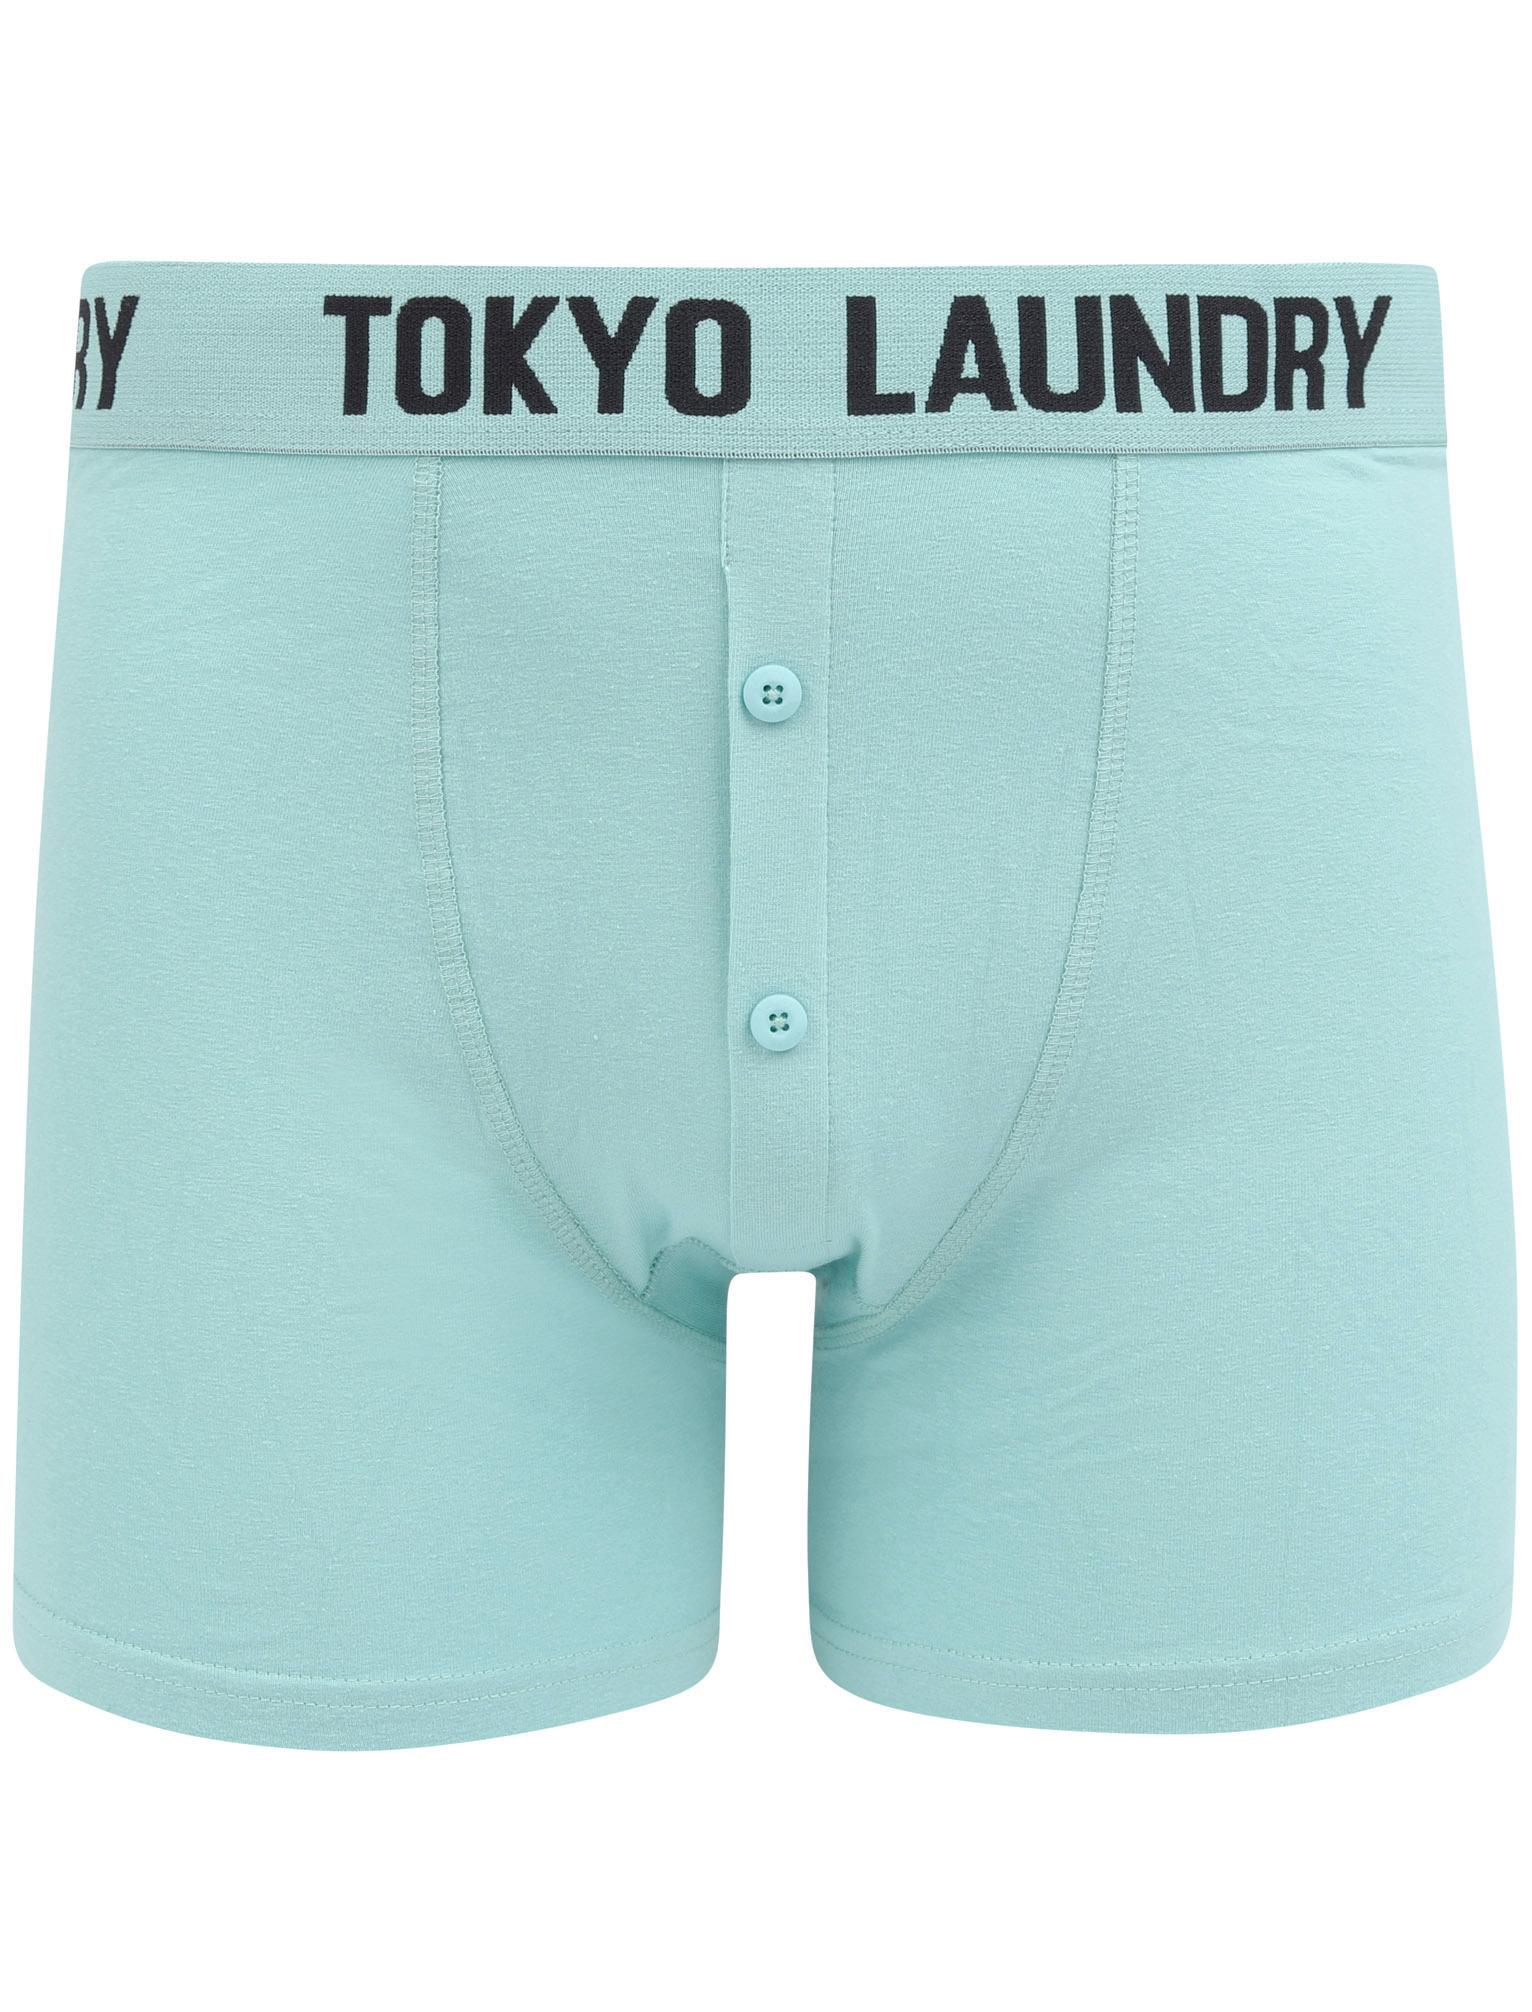 New-Mens-Tokyo-Laundry-2-Pack-Buttoned-Cotton-Rich-Boxer-Shorts-Set-Size-S-XXL thumbnail 15